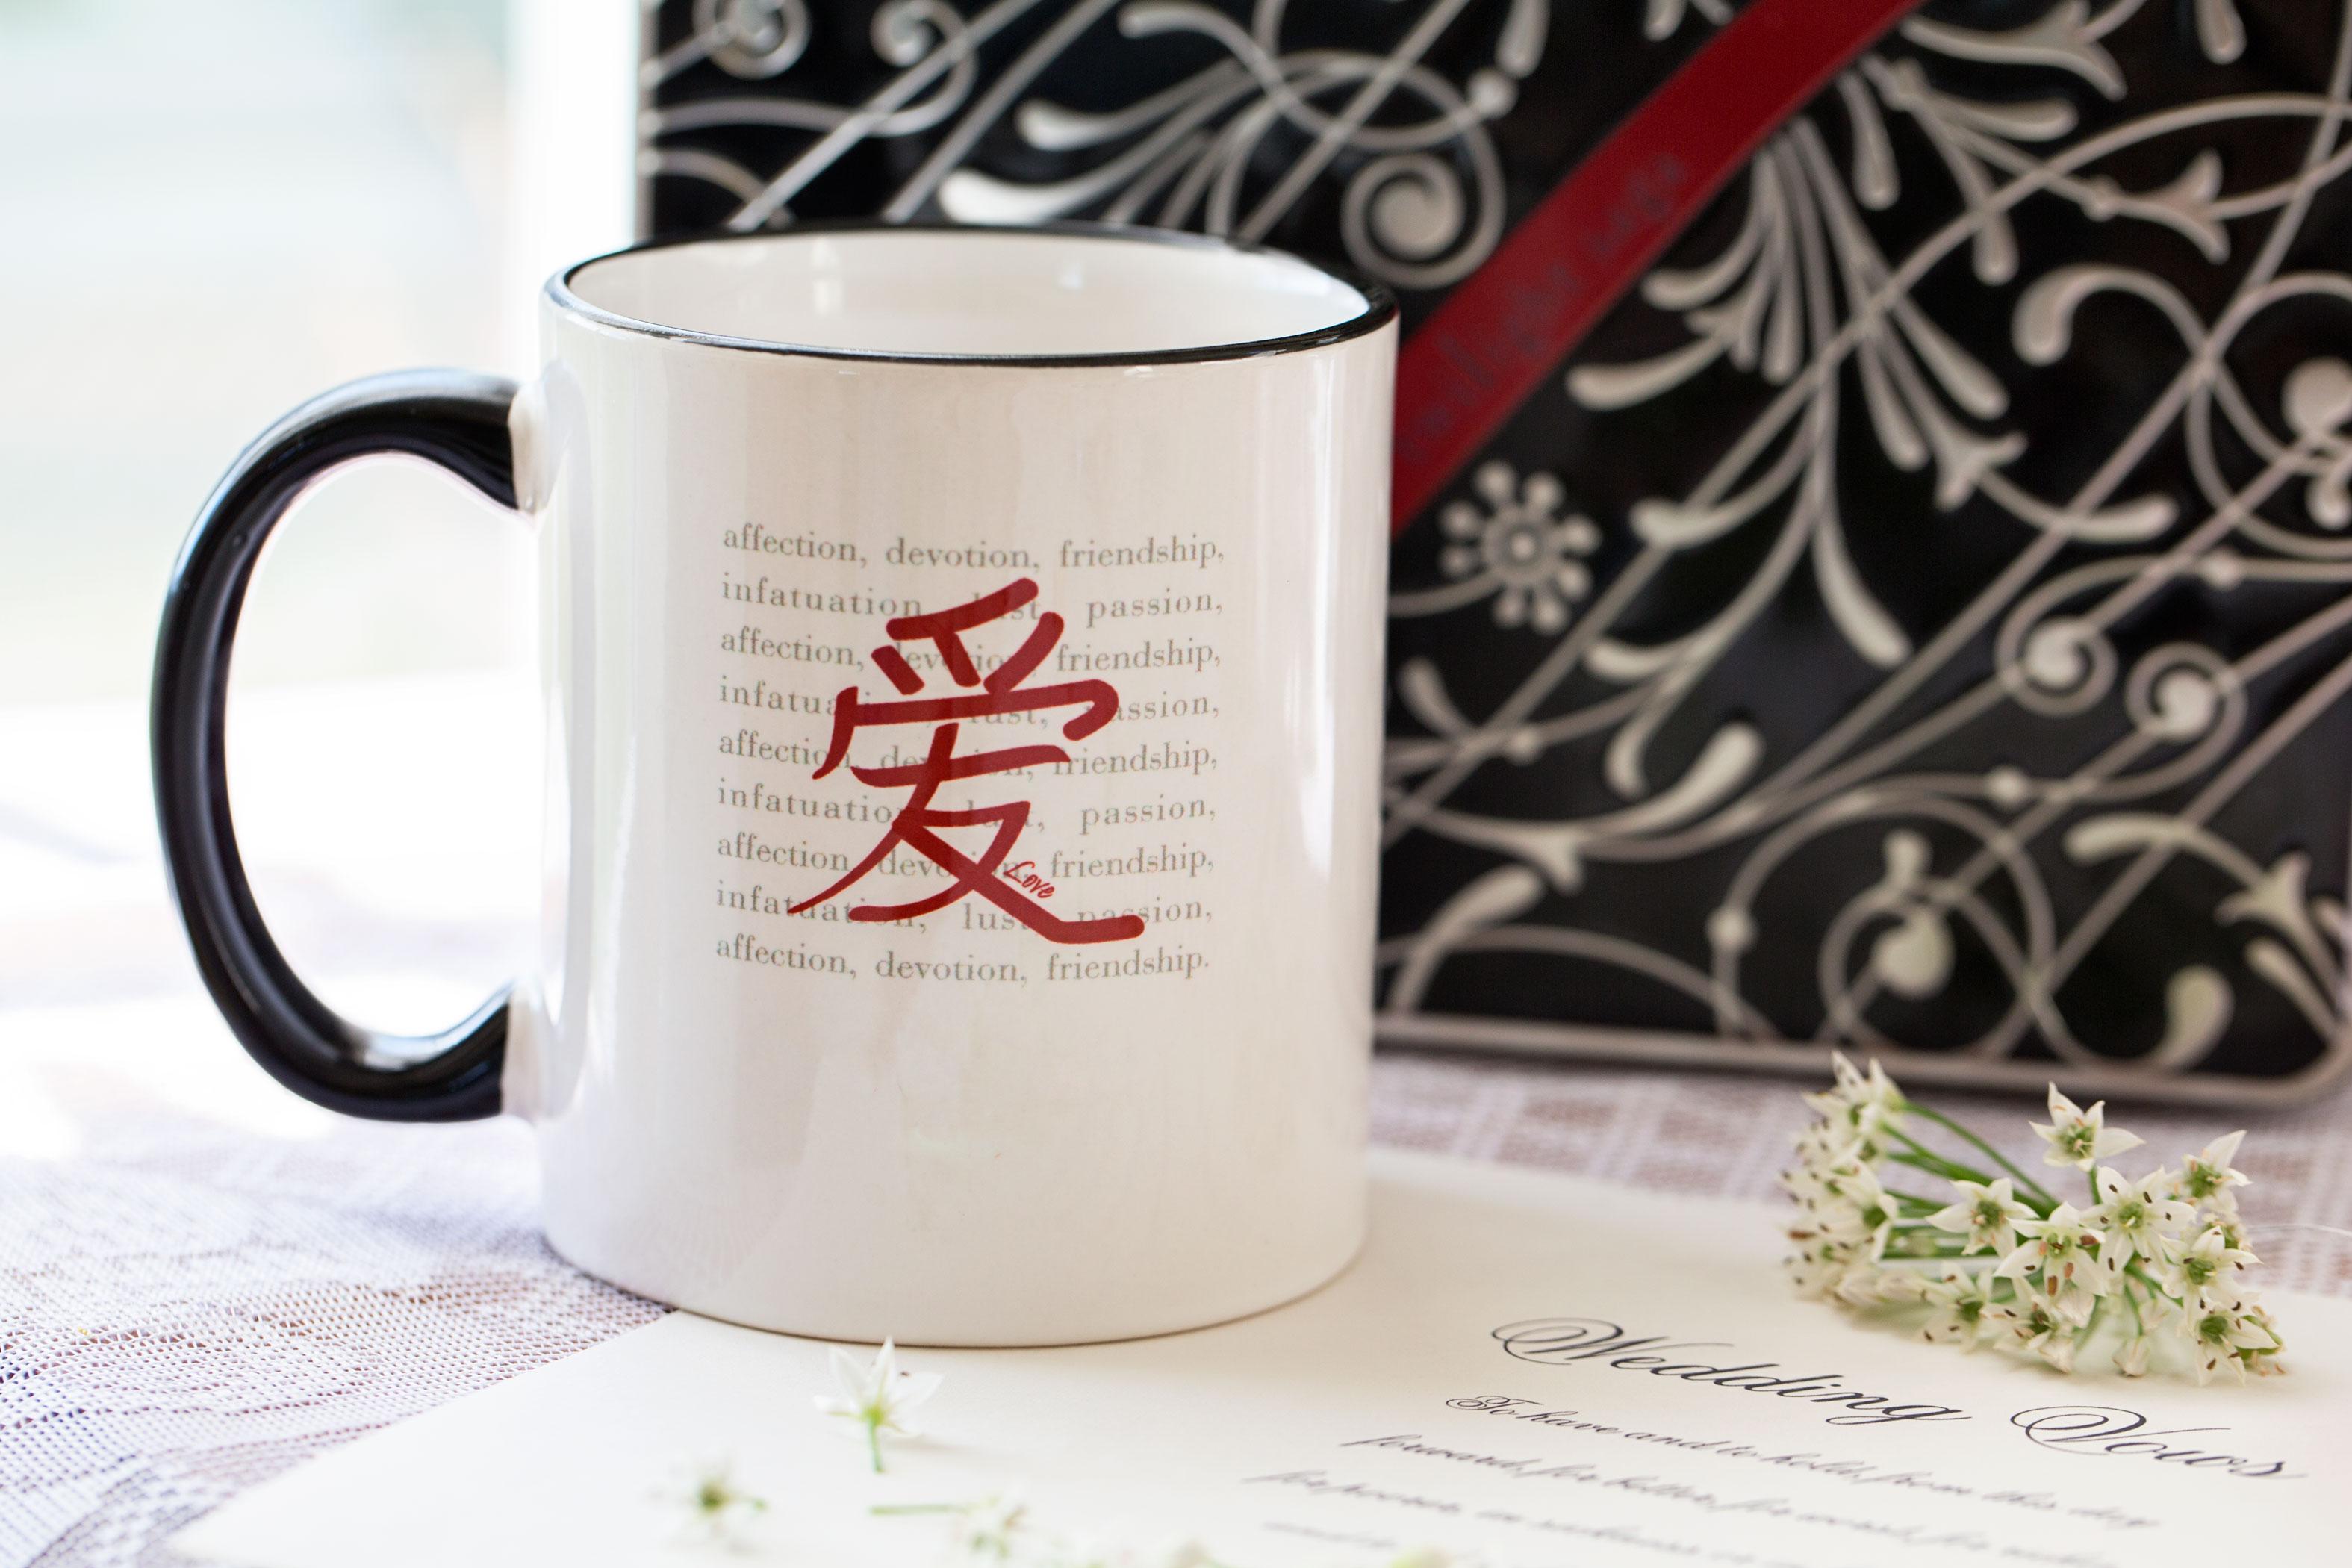 Gift For Husband 20th Wedding Anniversary : 20th Wedding Anniversary Gift Ideas for a Husband Our Everyday Life